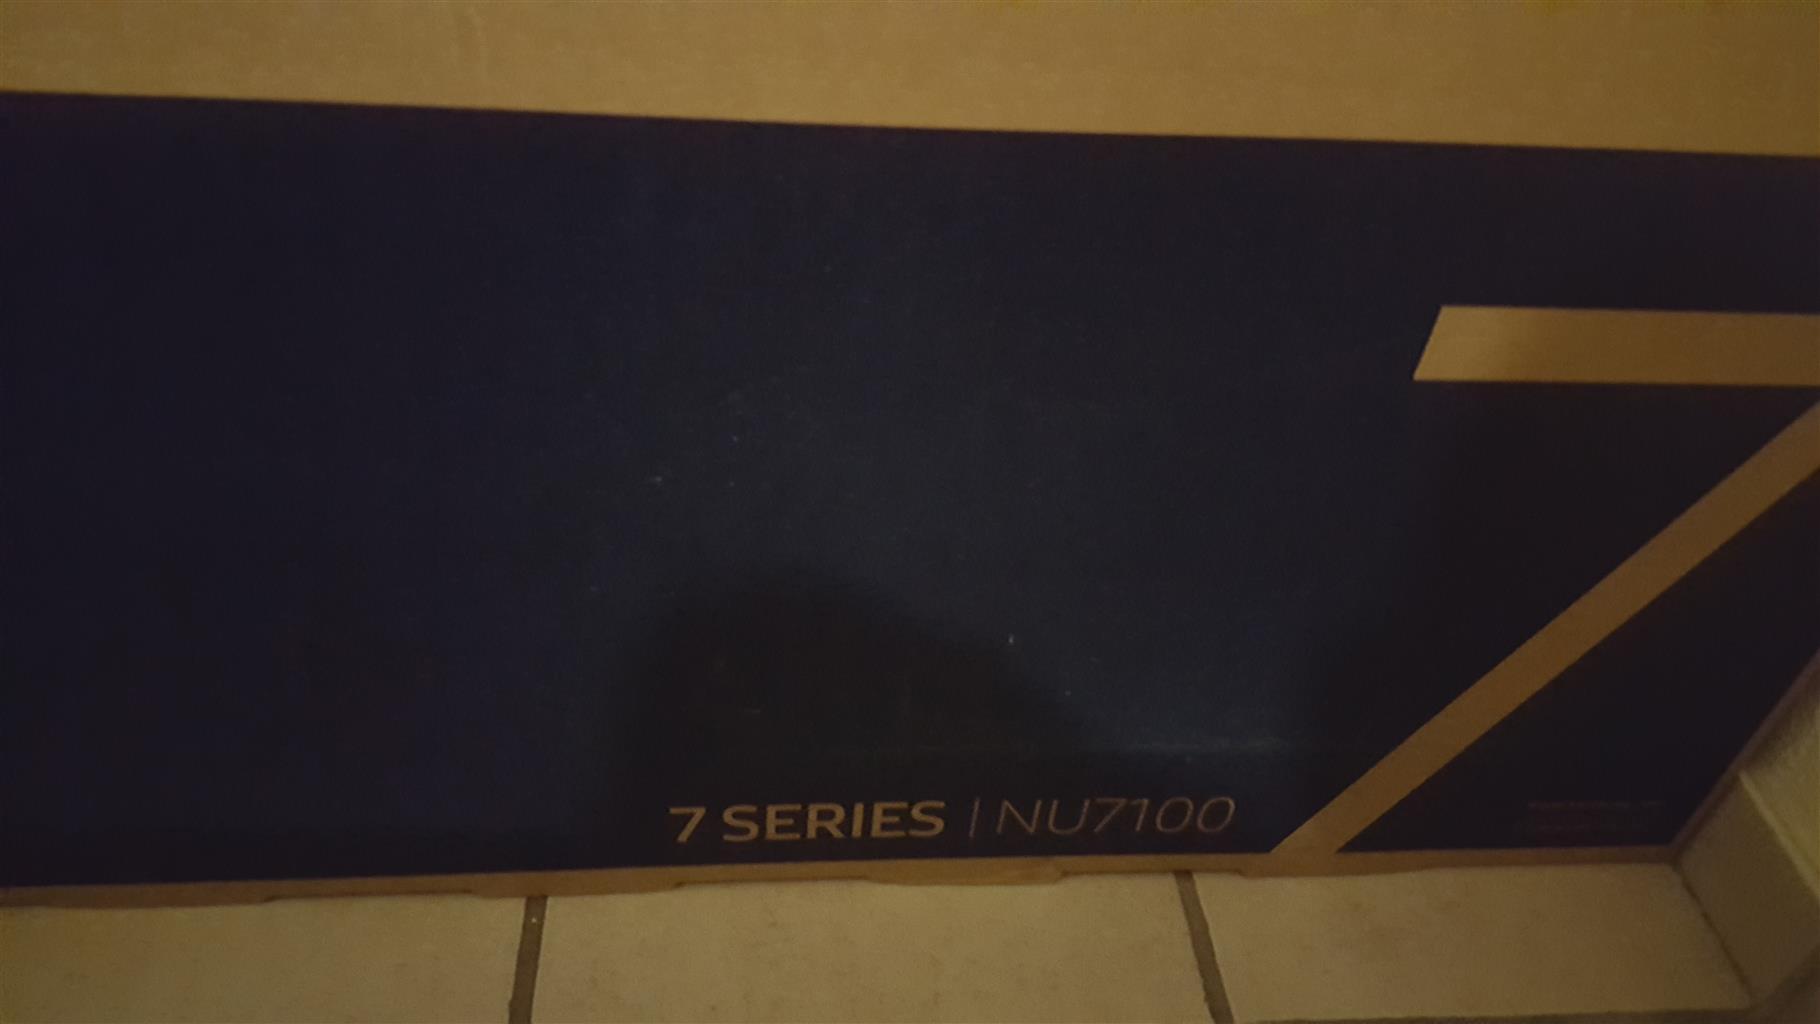 Samsung 55 inch UHD led tv - Unopened and Unused